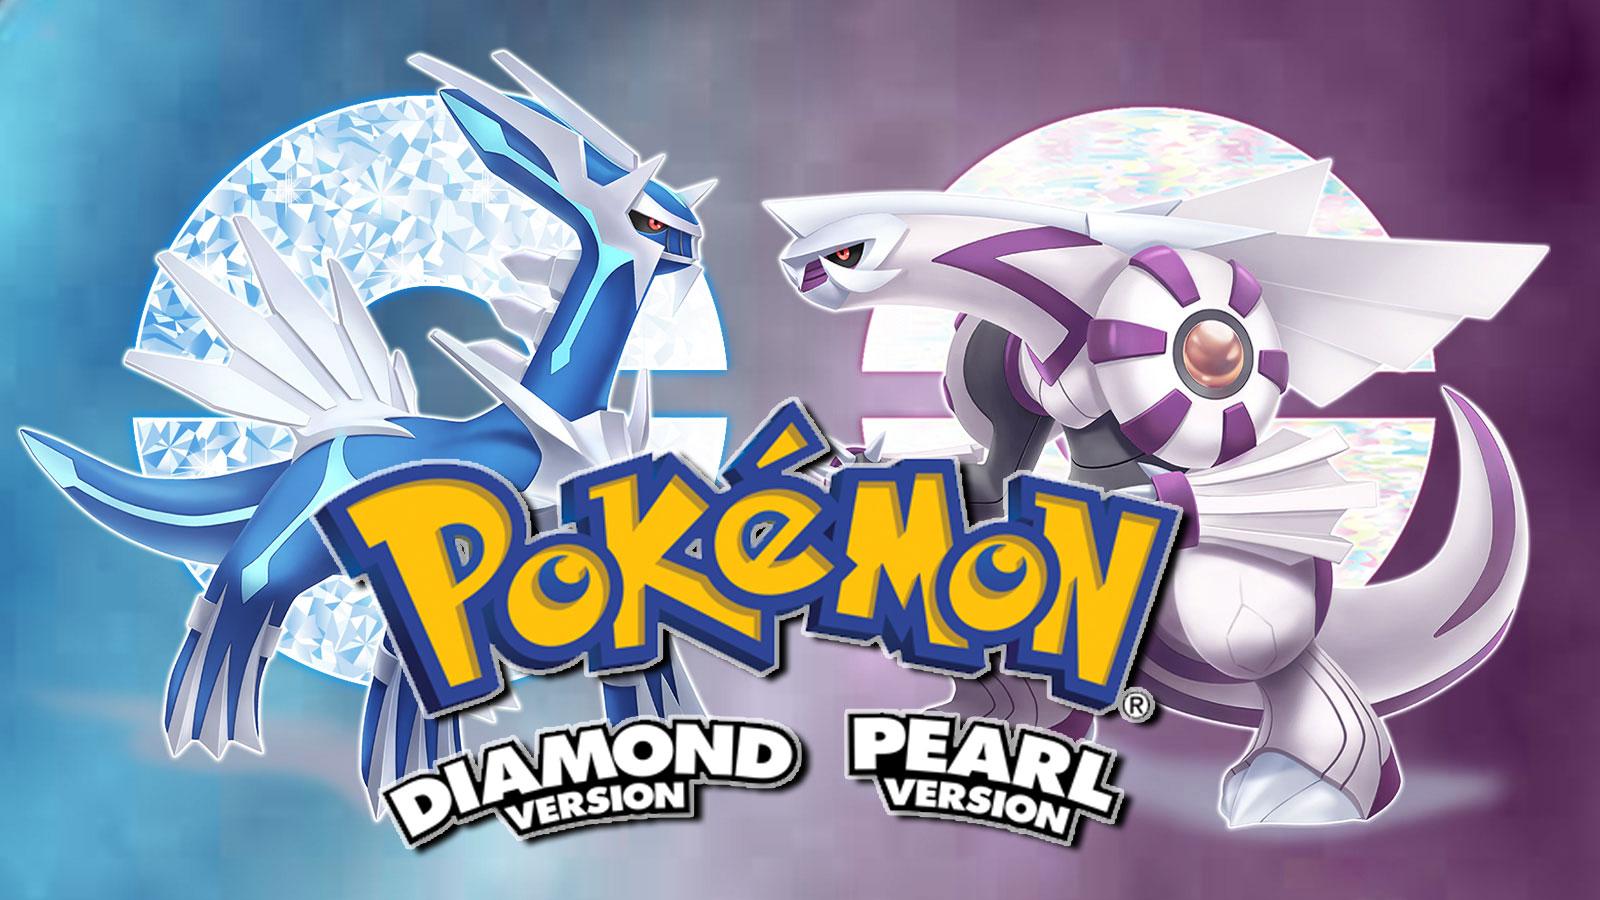 Screenshot of Pokemon Dialga and Palkia in Brilliant Diamond & Shining Pearl.